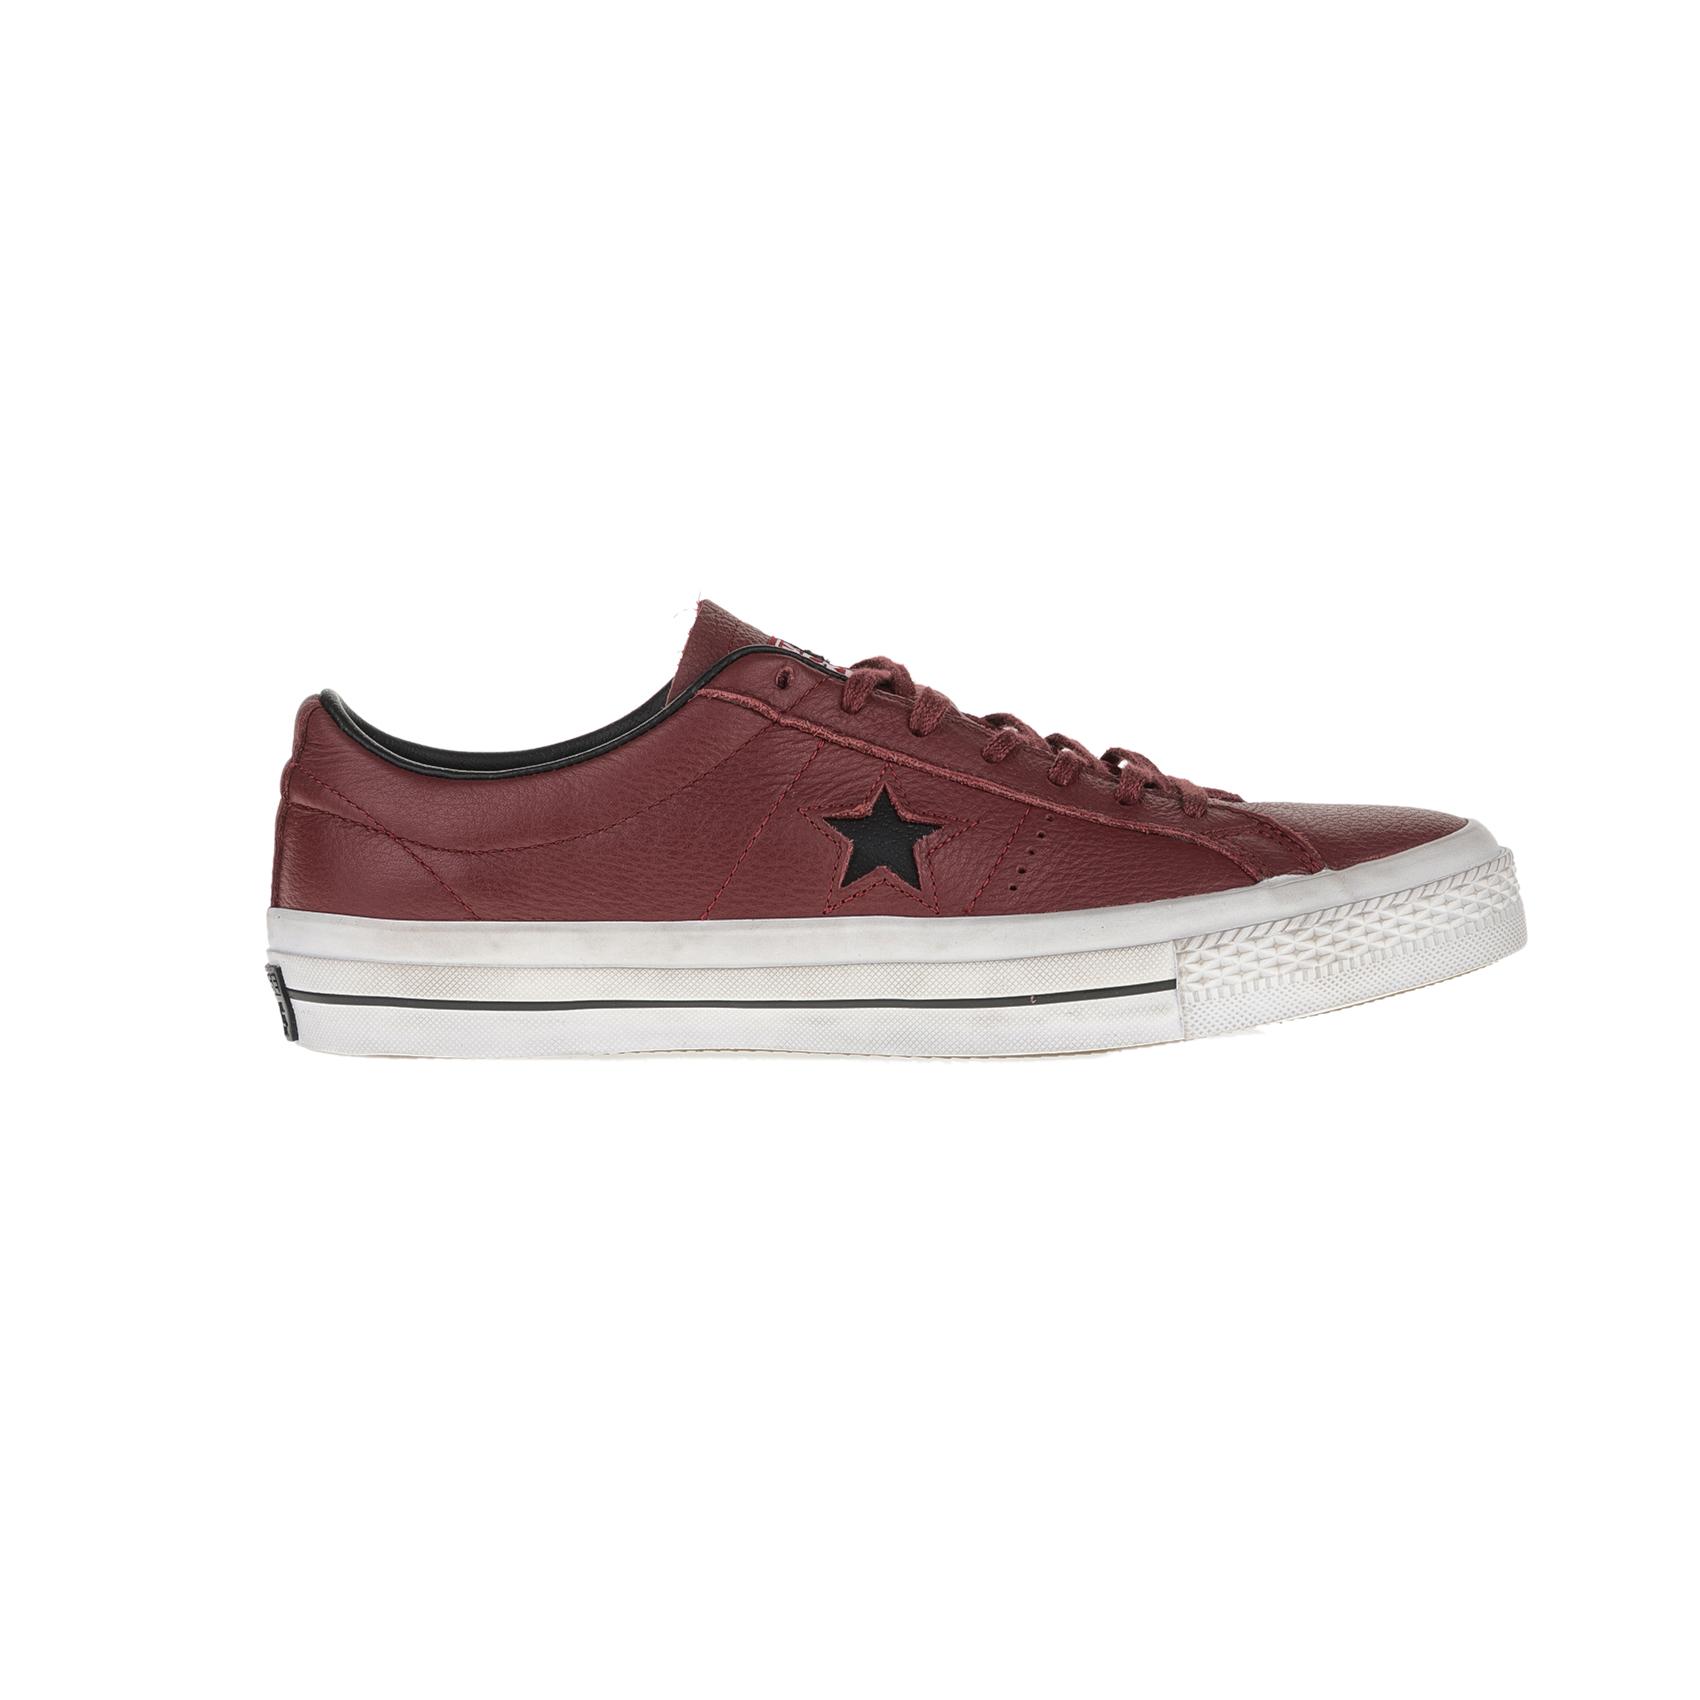 CONVERSE – Αθλητικά παπούτσια One Star Ox μπορντό